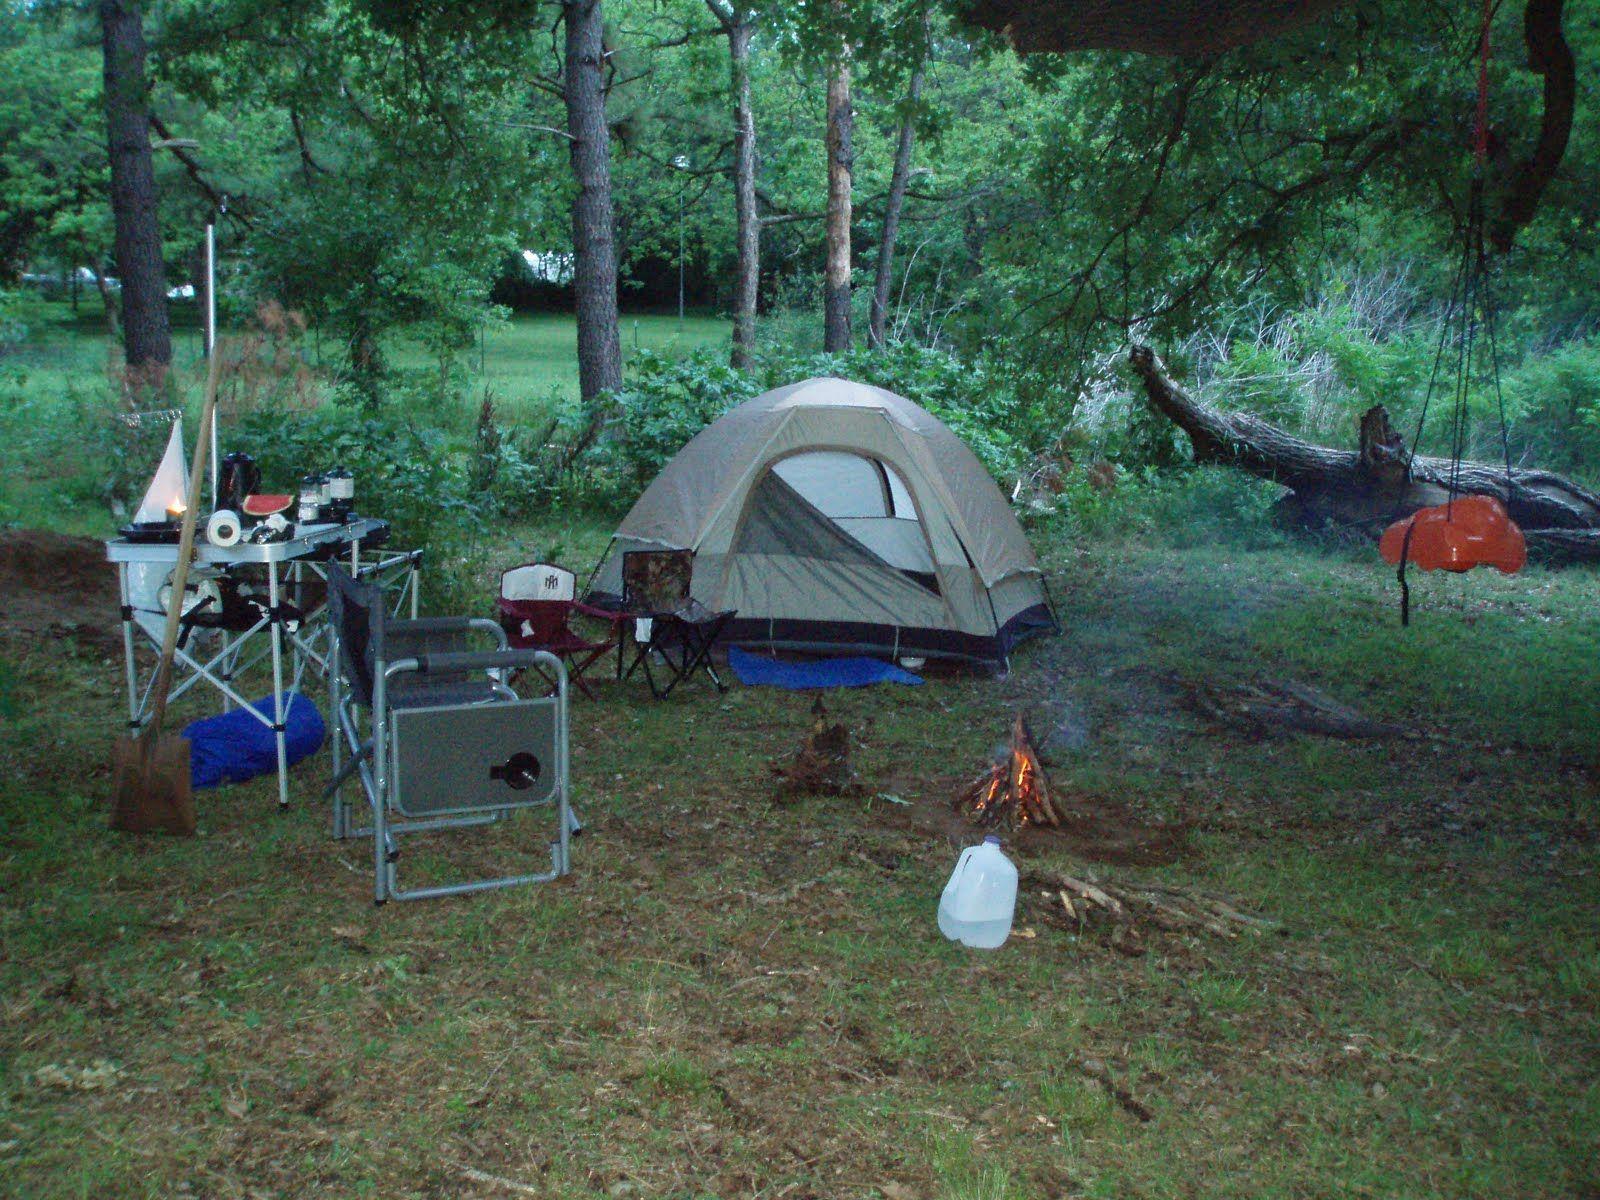 C&ing Tent Set Up Ideas & Camping Tent Set Up Ideas | Best Campsite Setup | Pinterest | Tents